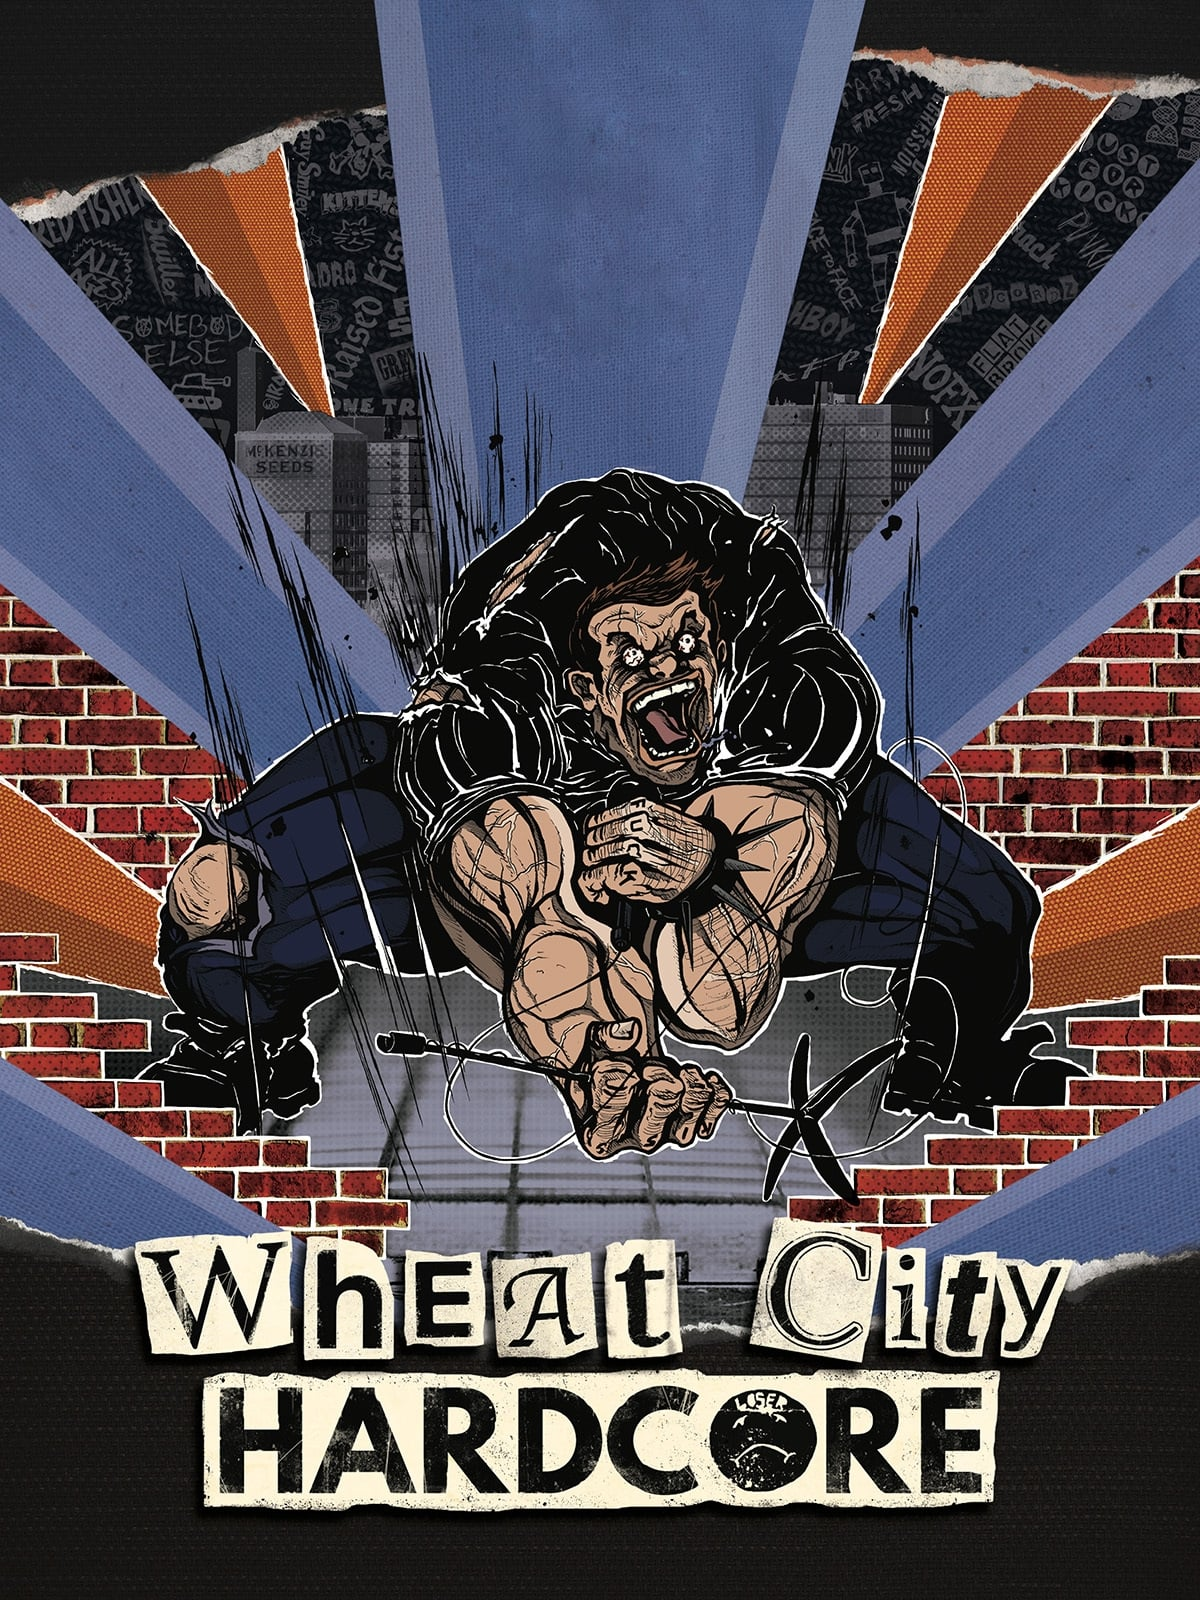 Wheat City Hardcore on FREECABLE TV